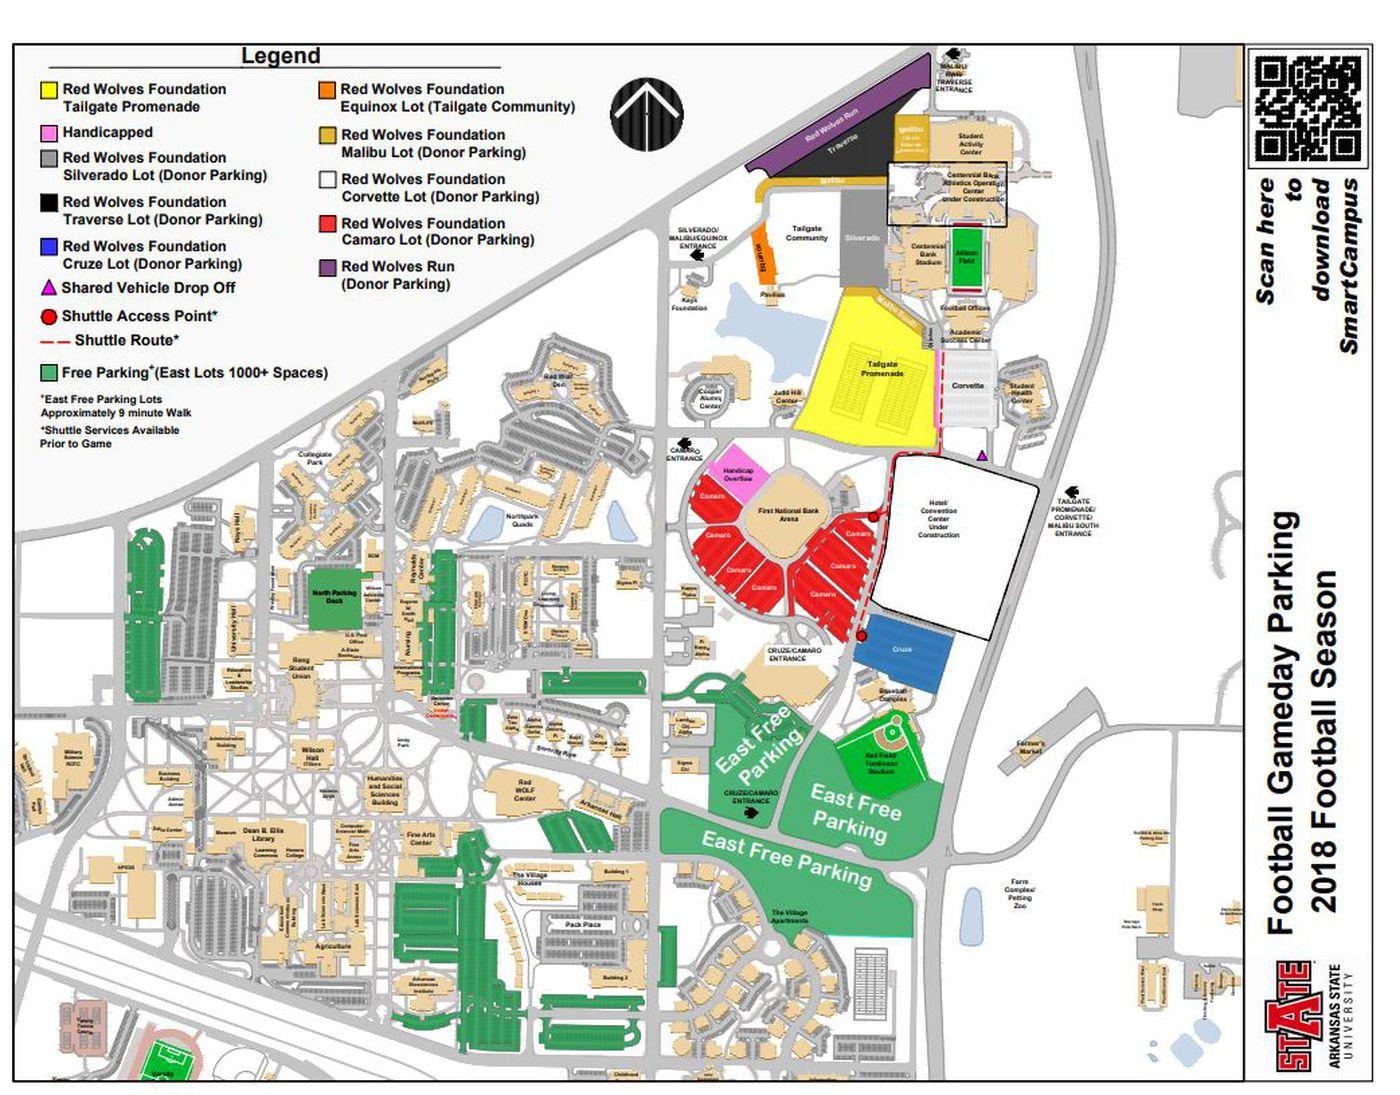 Asu Jonesboro Campus Map.A State Drops 10 Game Day Parking Fee Following Region 8 Report